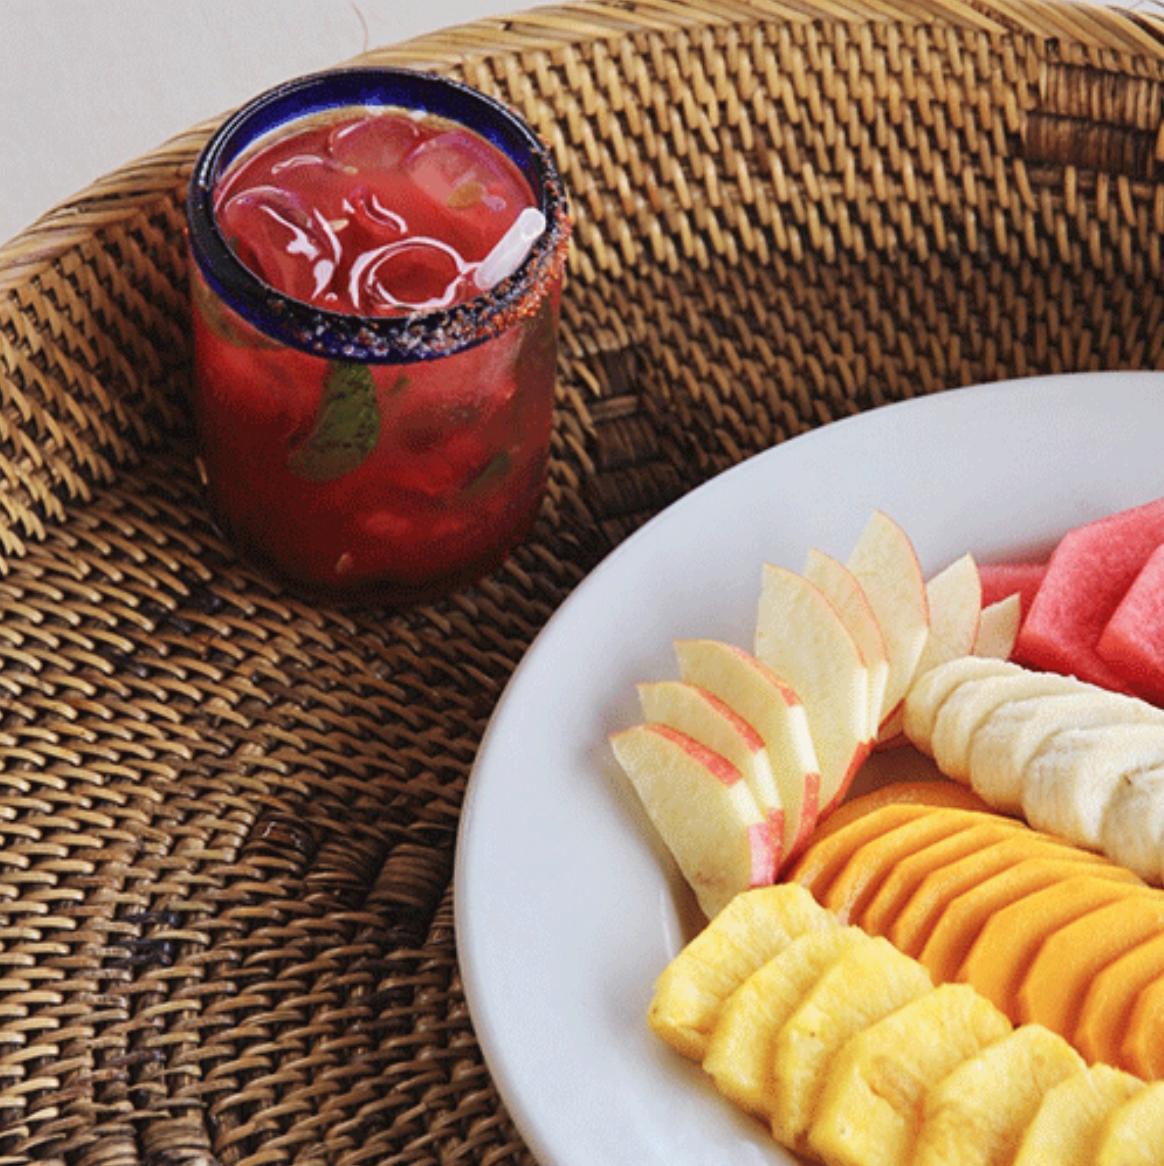 breakfast - ● fresh fruit● yogurt● amaranth● eggs